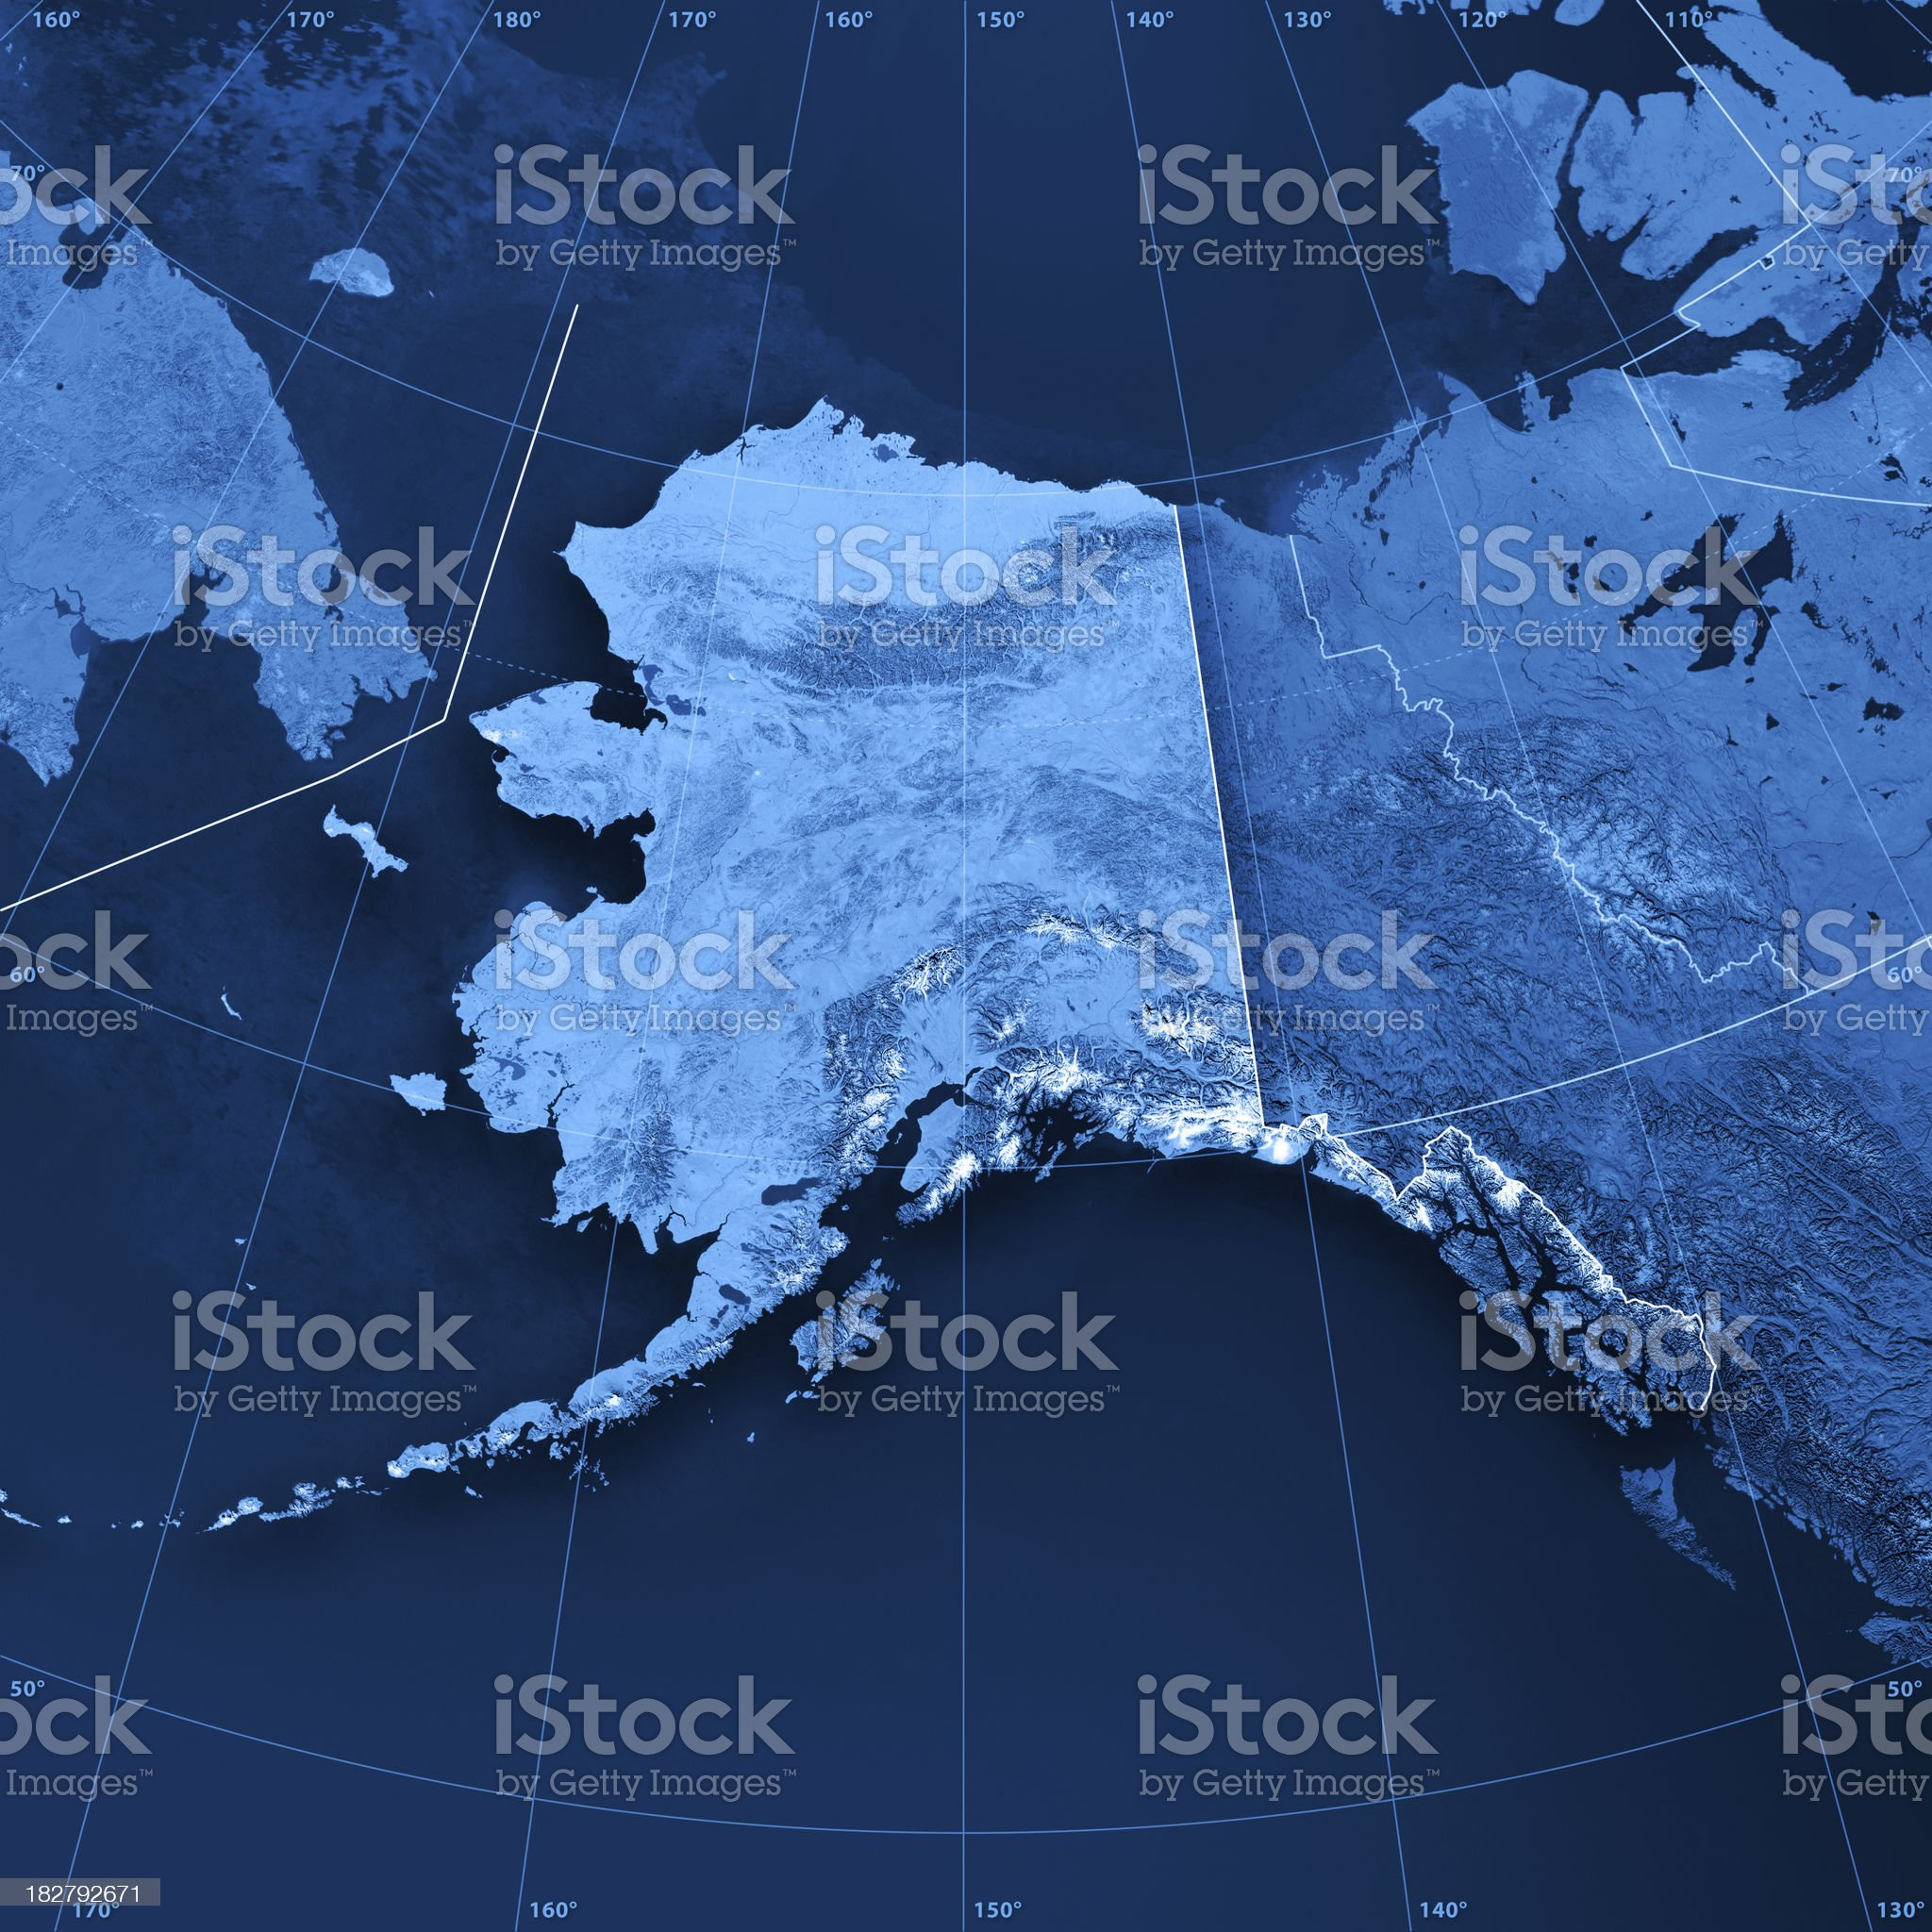 Alaska Topographic Map royalty-free stock photo